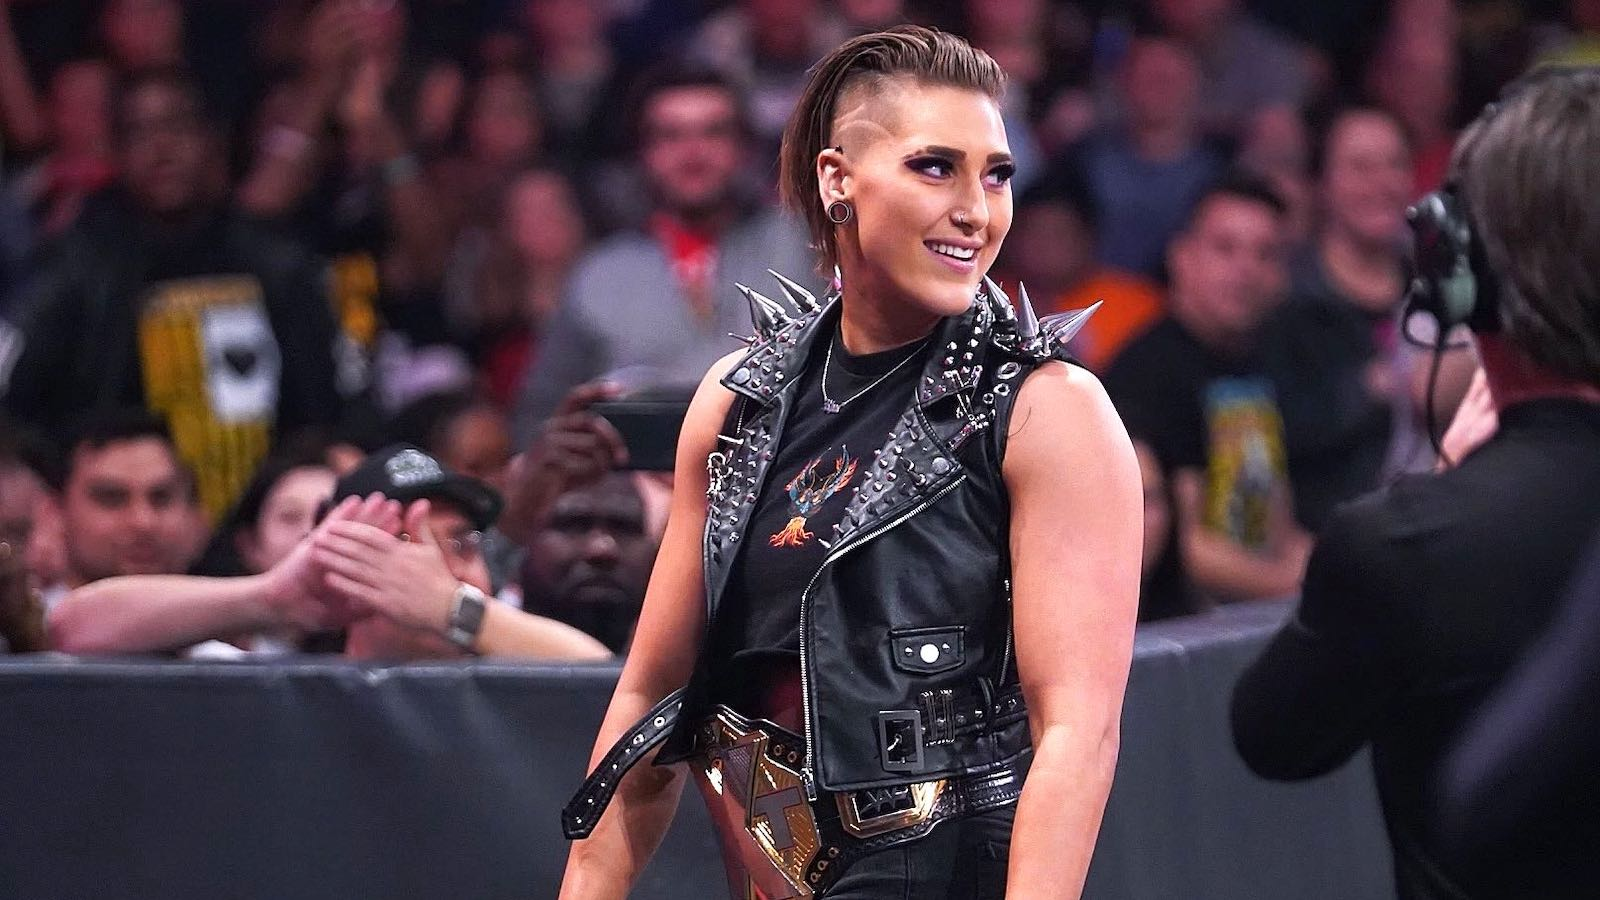 Shotzi Blackheart acredita que Rhea Ripley deve ser promovida ao main roster da WWE